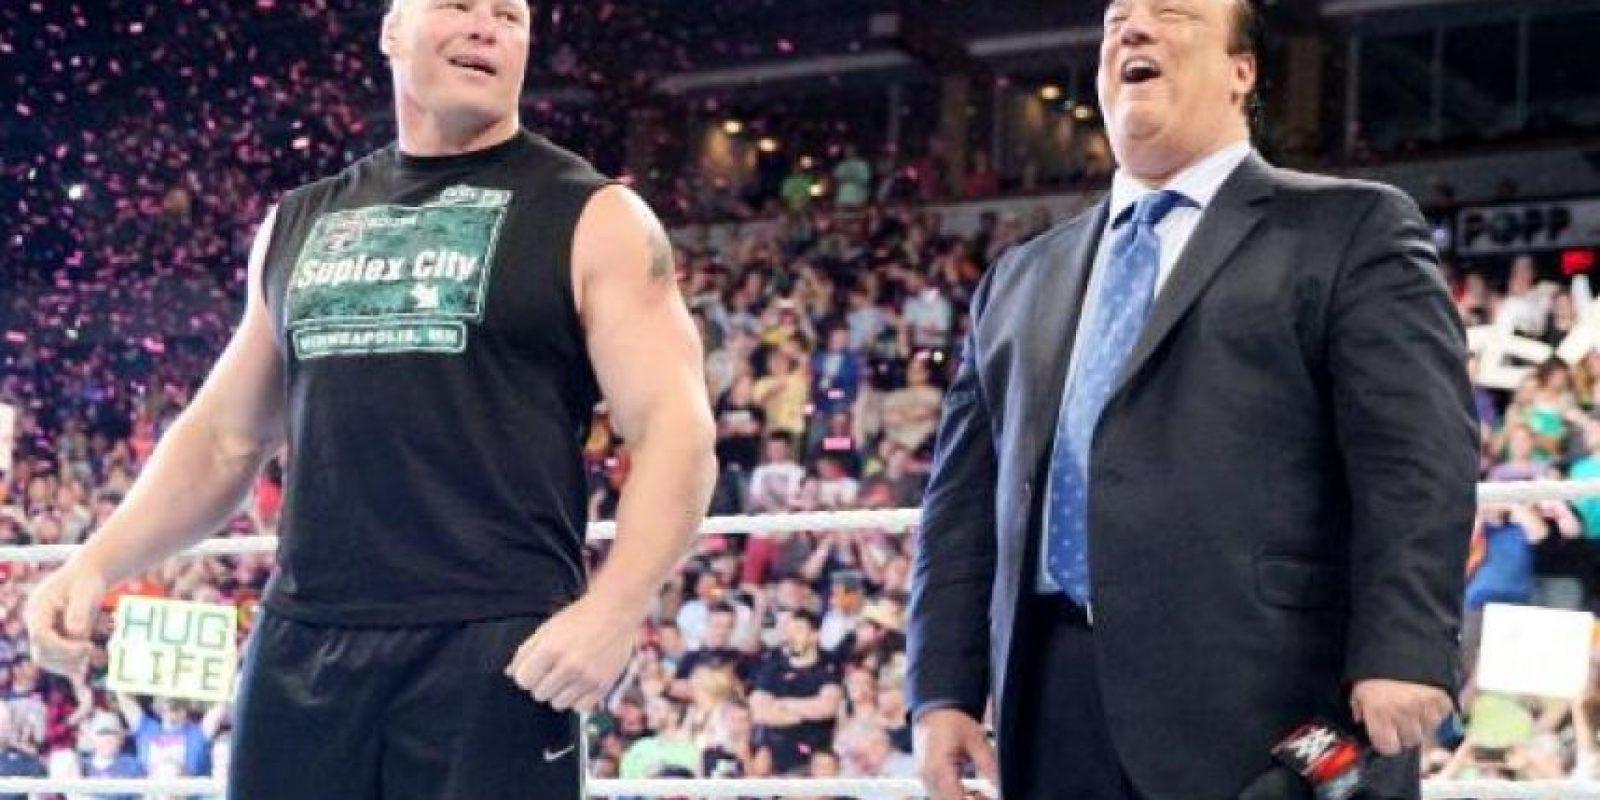 La pelea estelar la protagonizará Brock Lesnar Foto:WWE